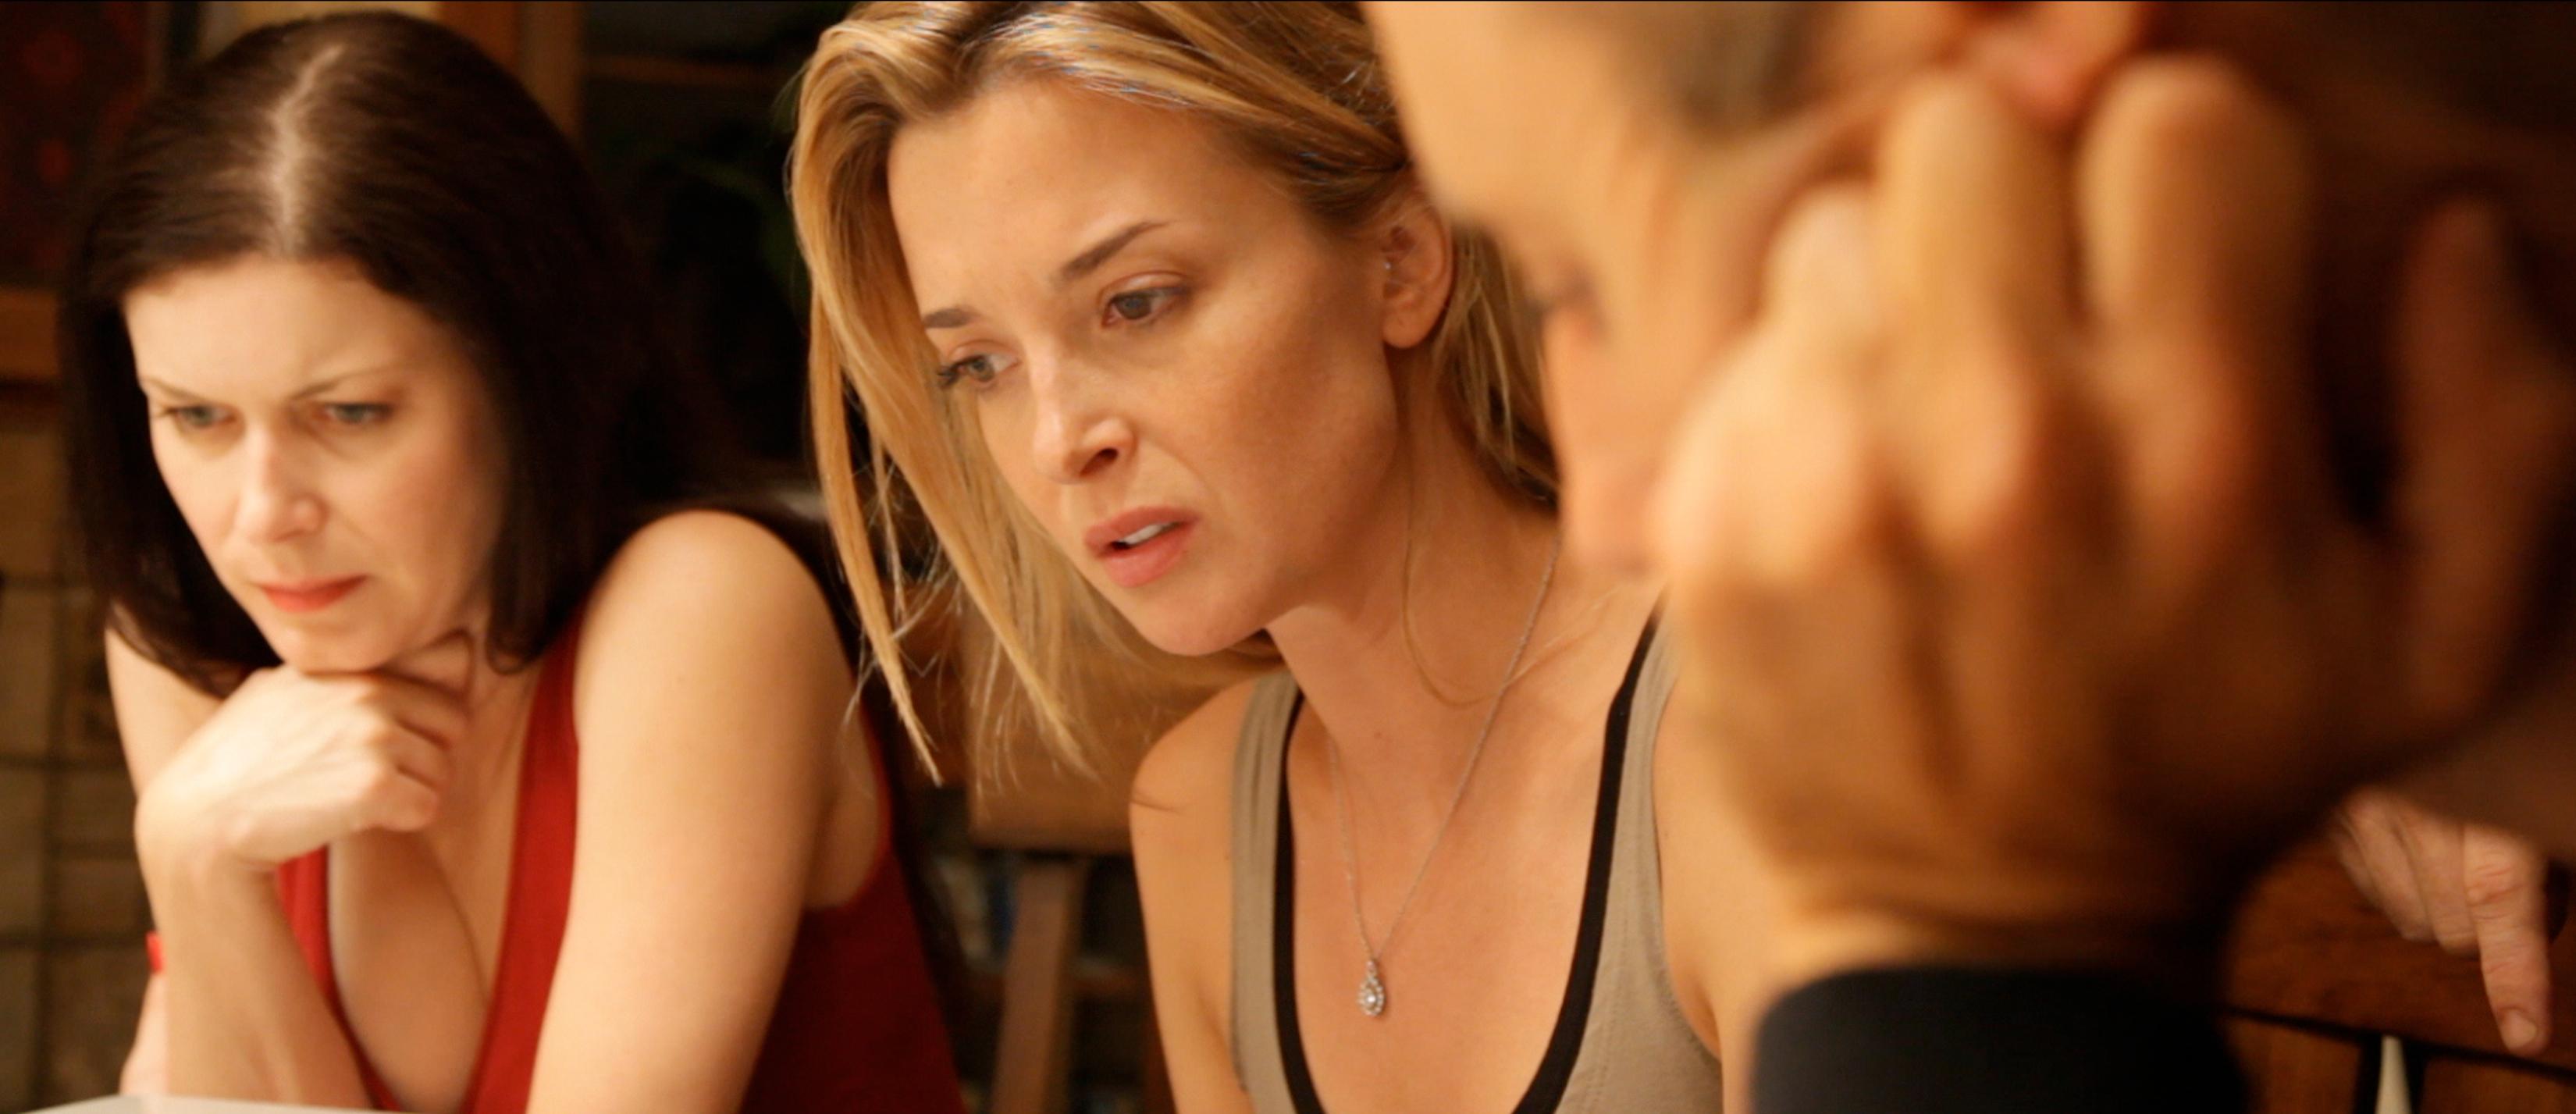 Fotograma de la película Coherence